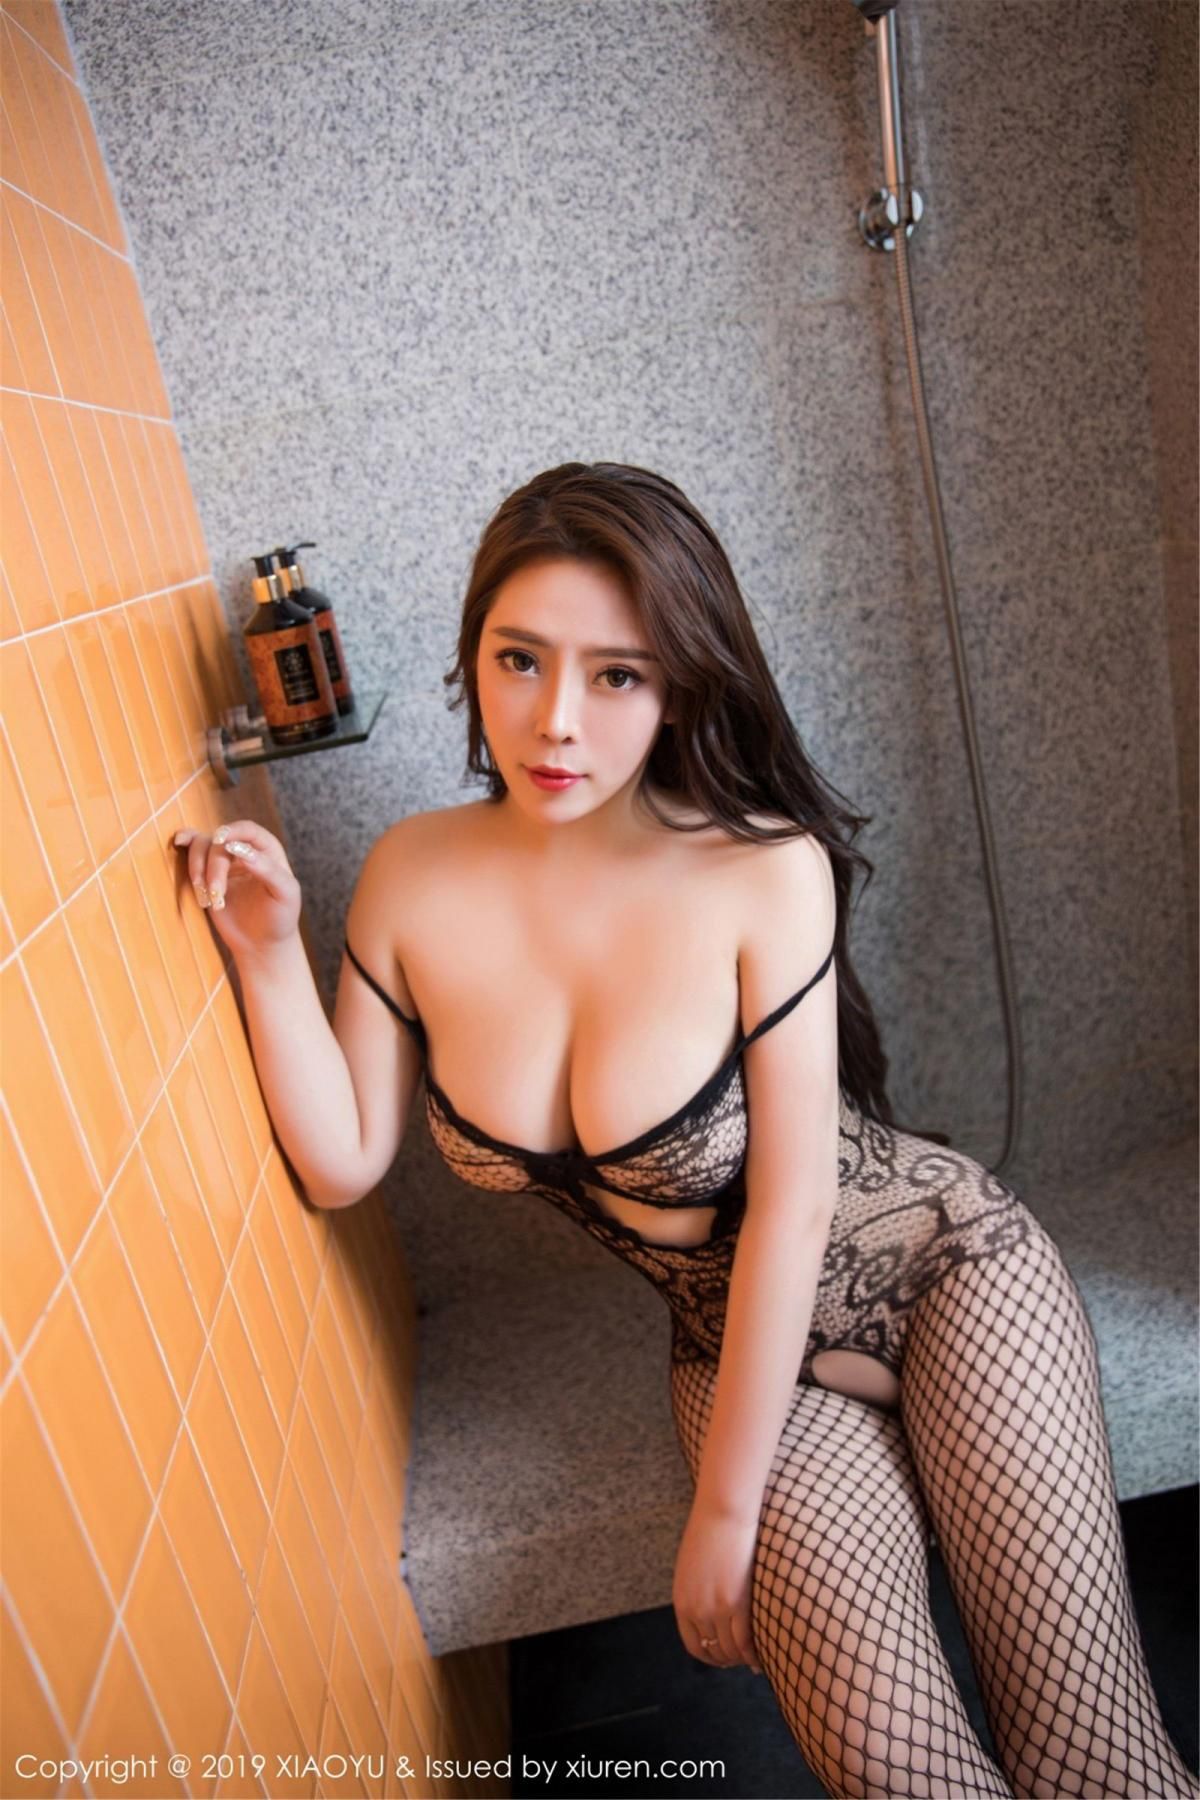 [XiaoYu] Vol.058 Miki Tu 27P, Miki Tu, XiaoYu